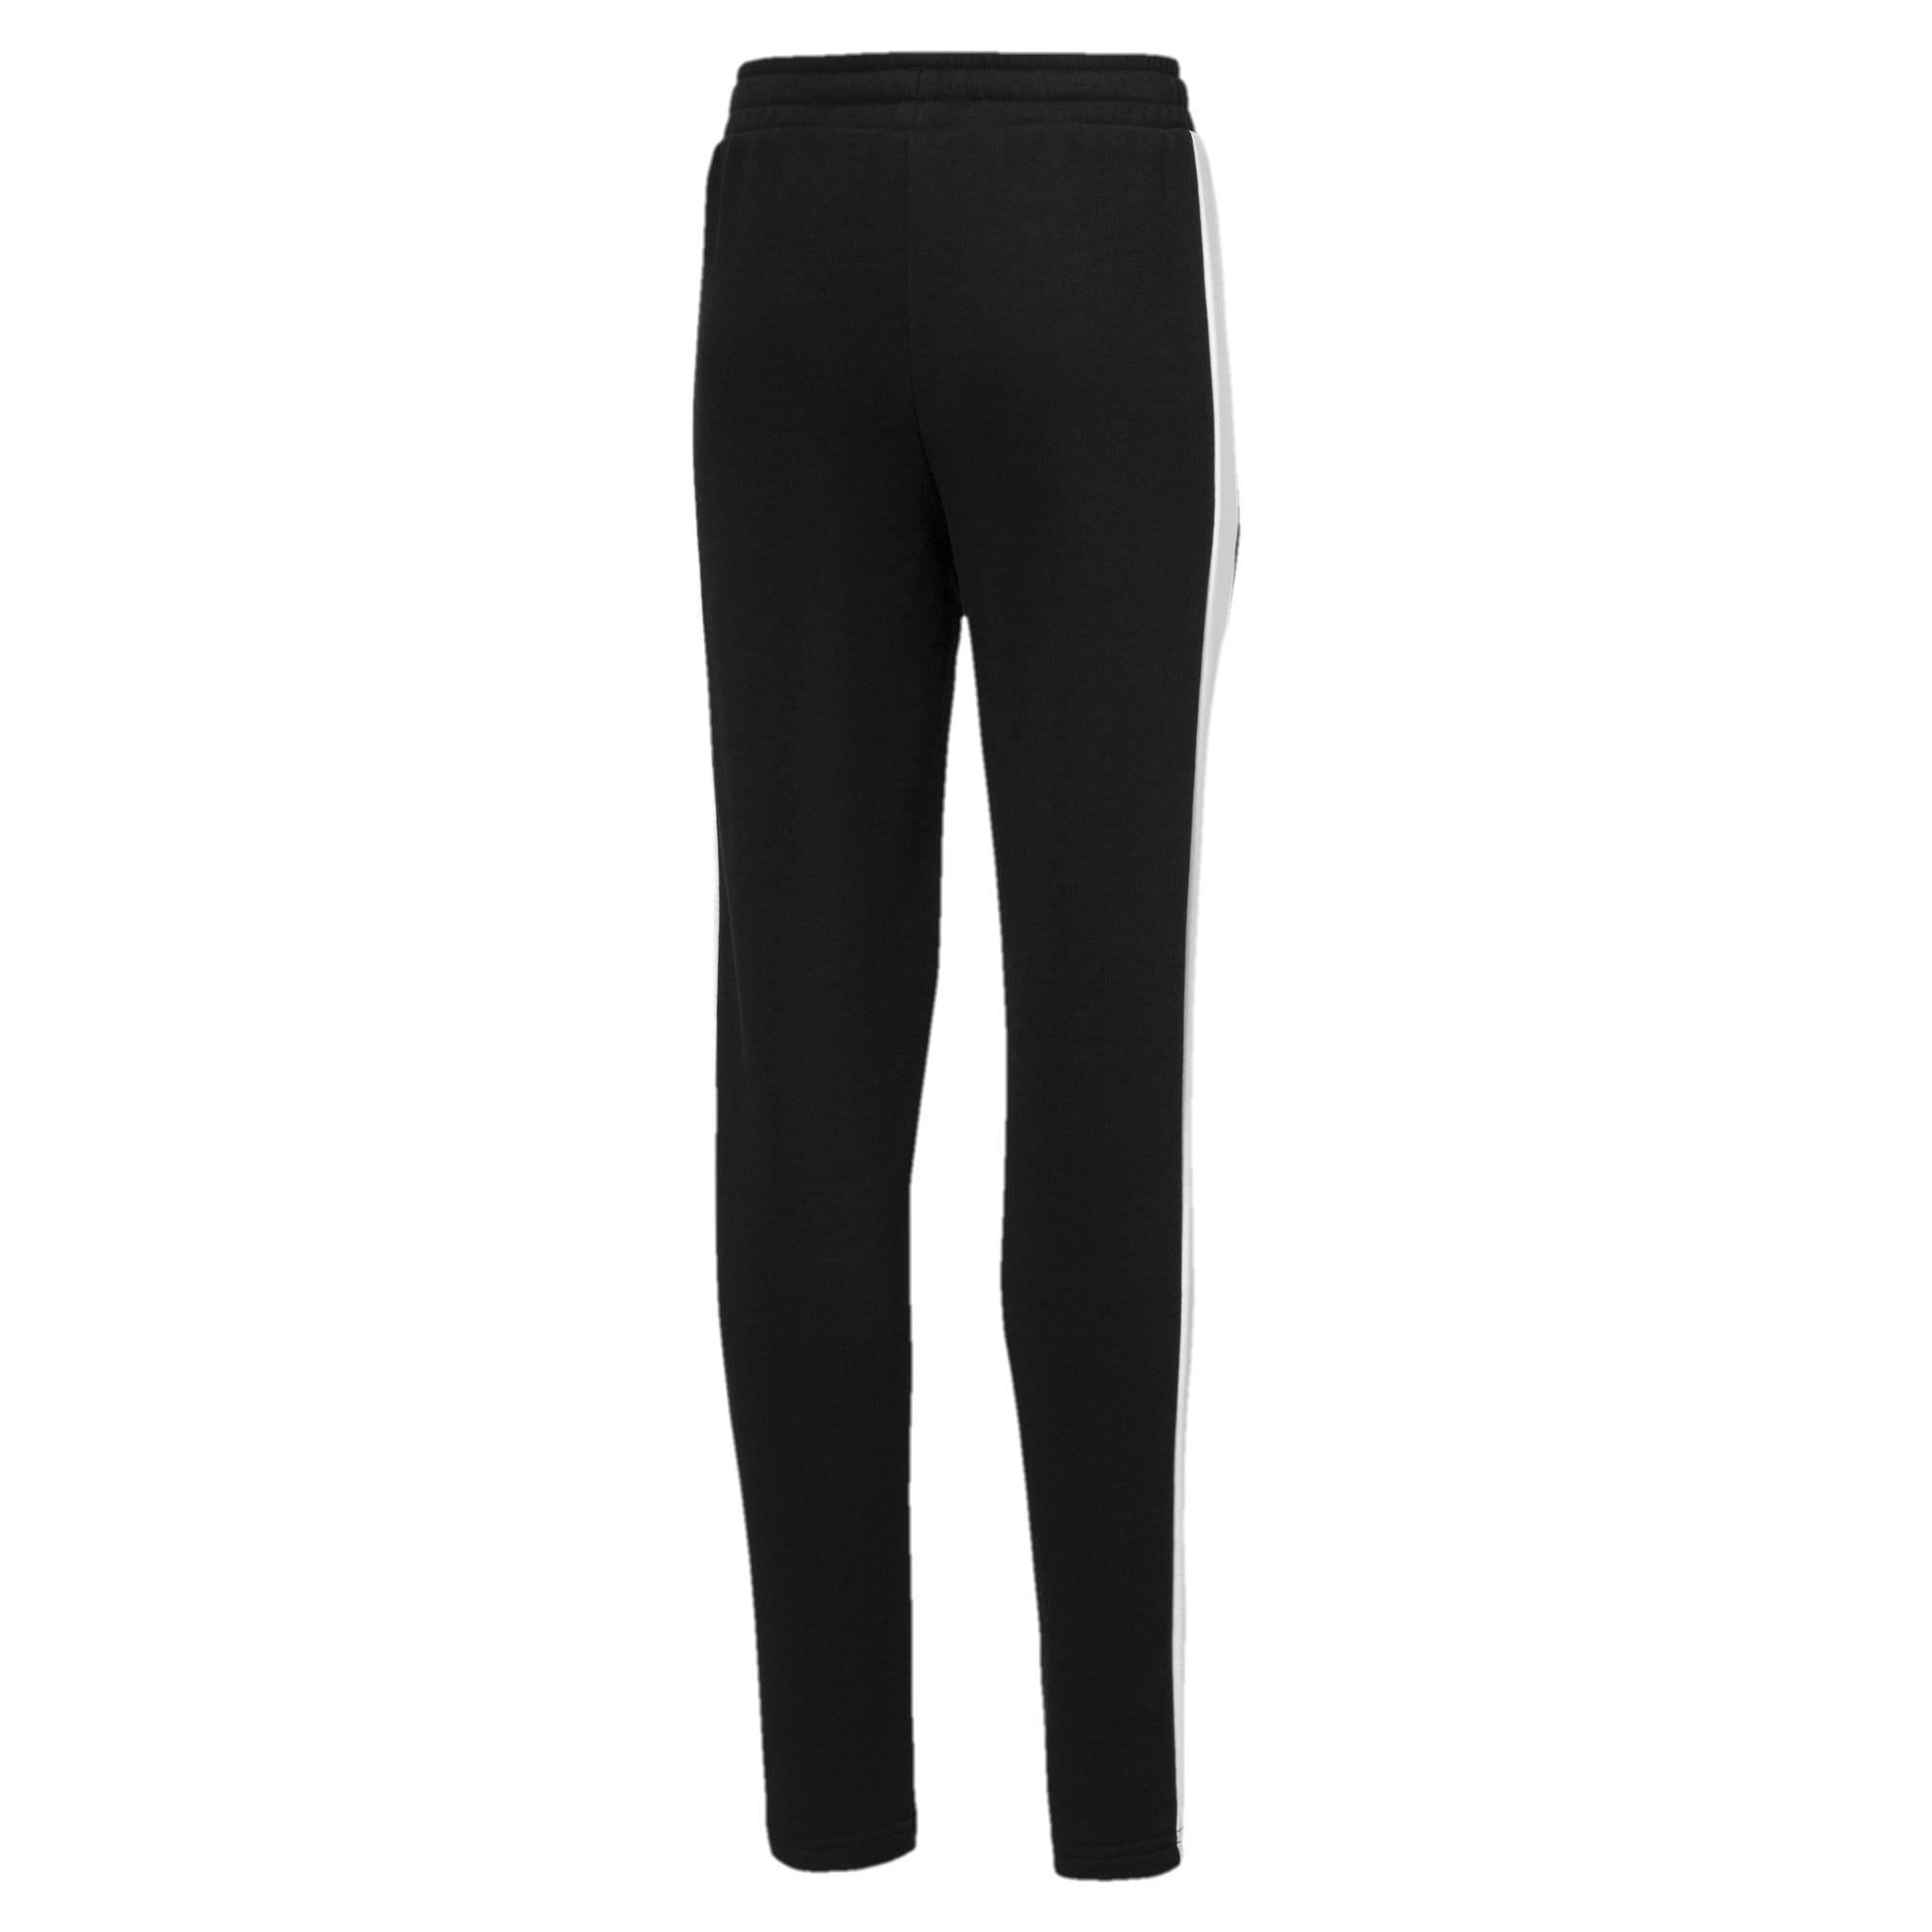 Thumbnail 2 of Classics Girls' T7 Sweatpants JR, Cotton Black, medium